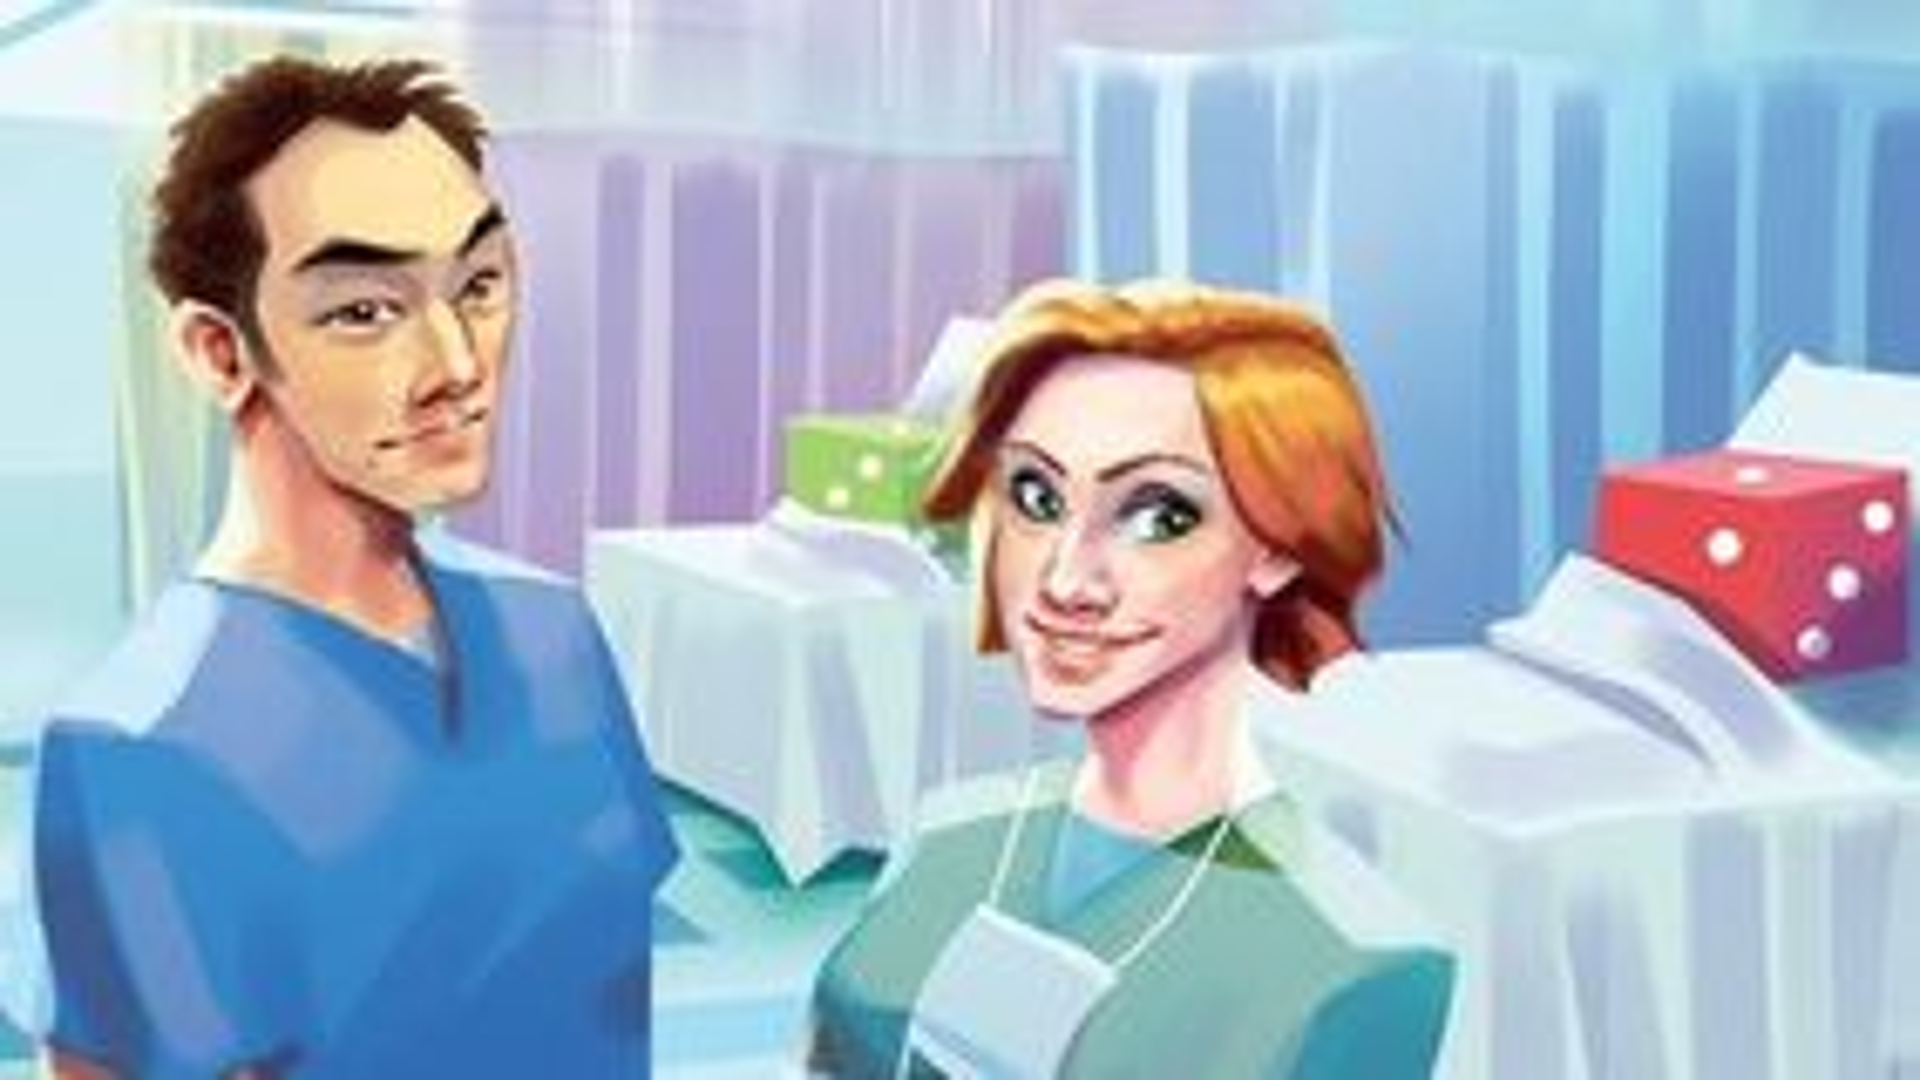 Dice Hospital: Emergency Roll board game artwork